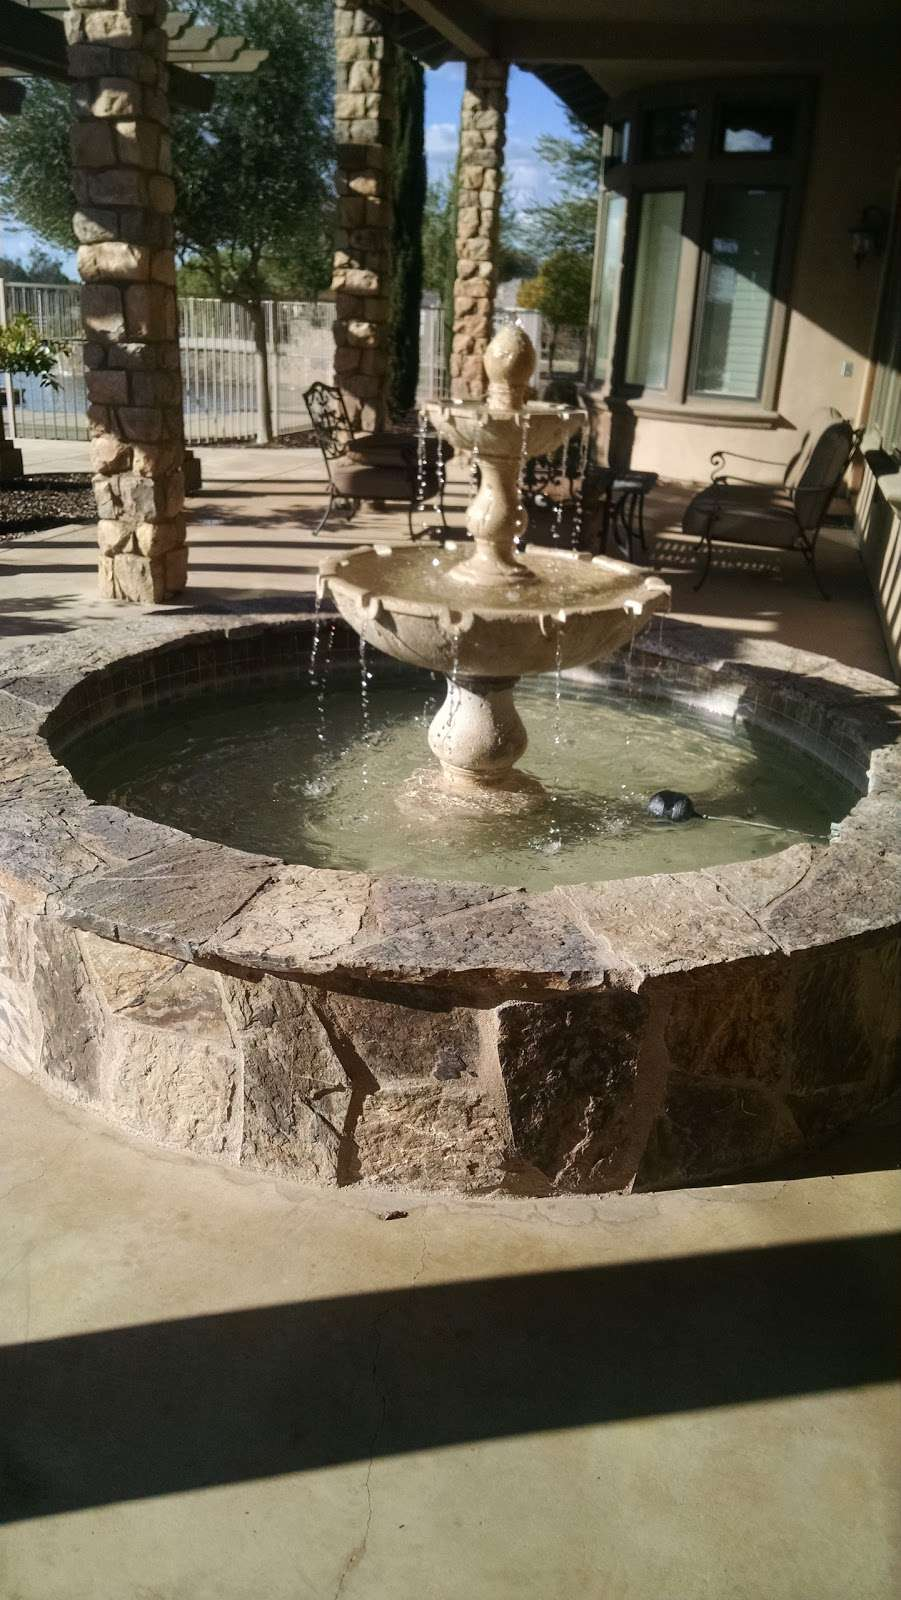 All American Team Inc - plumber  | Photo 7 of 10 | Address: ***No longer at this address***, 30275, Vía Val Verde, Temecula, CA 92591, USA | Phone: (888) 477-2877